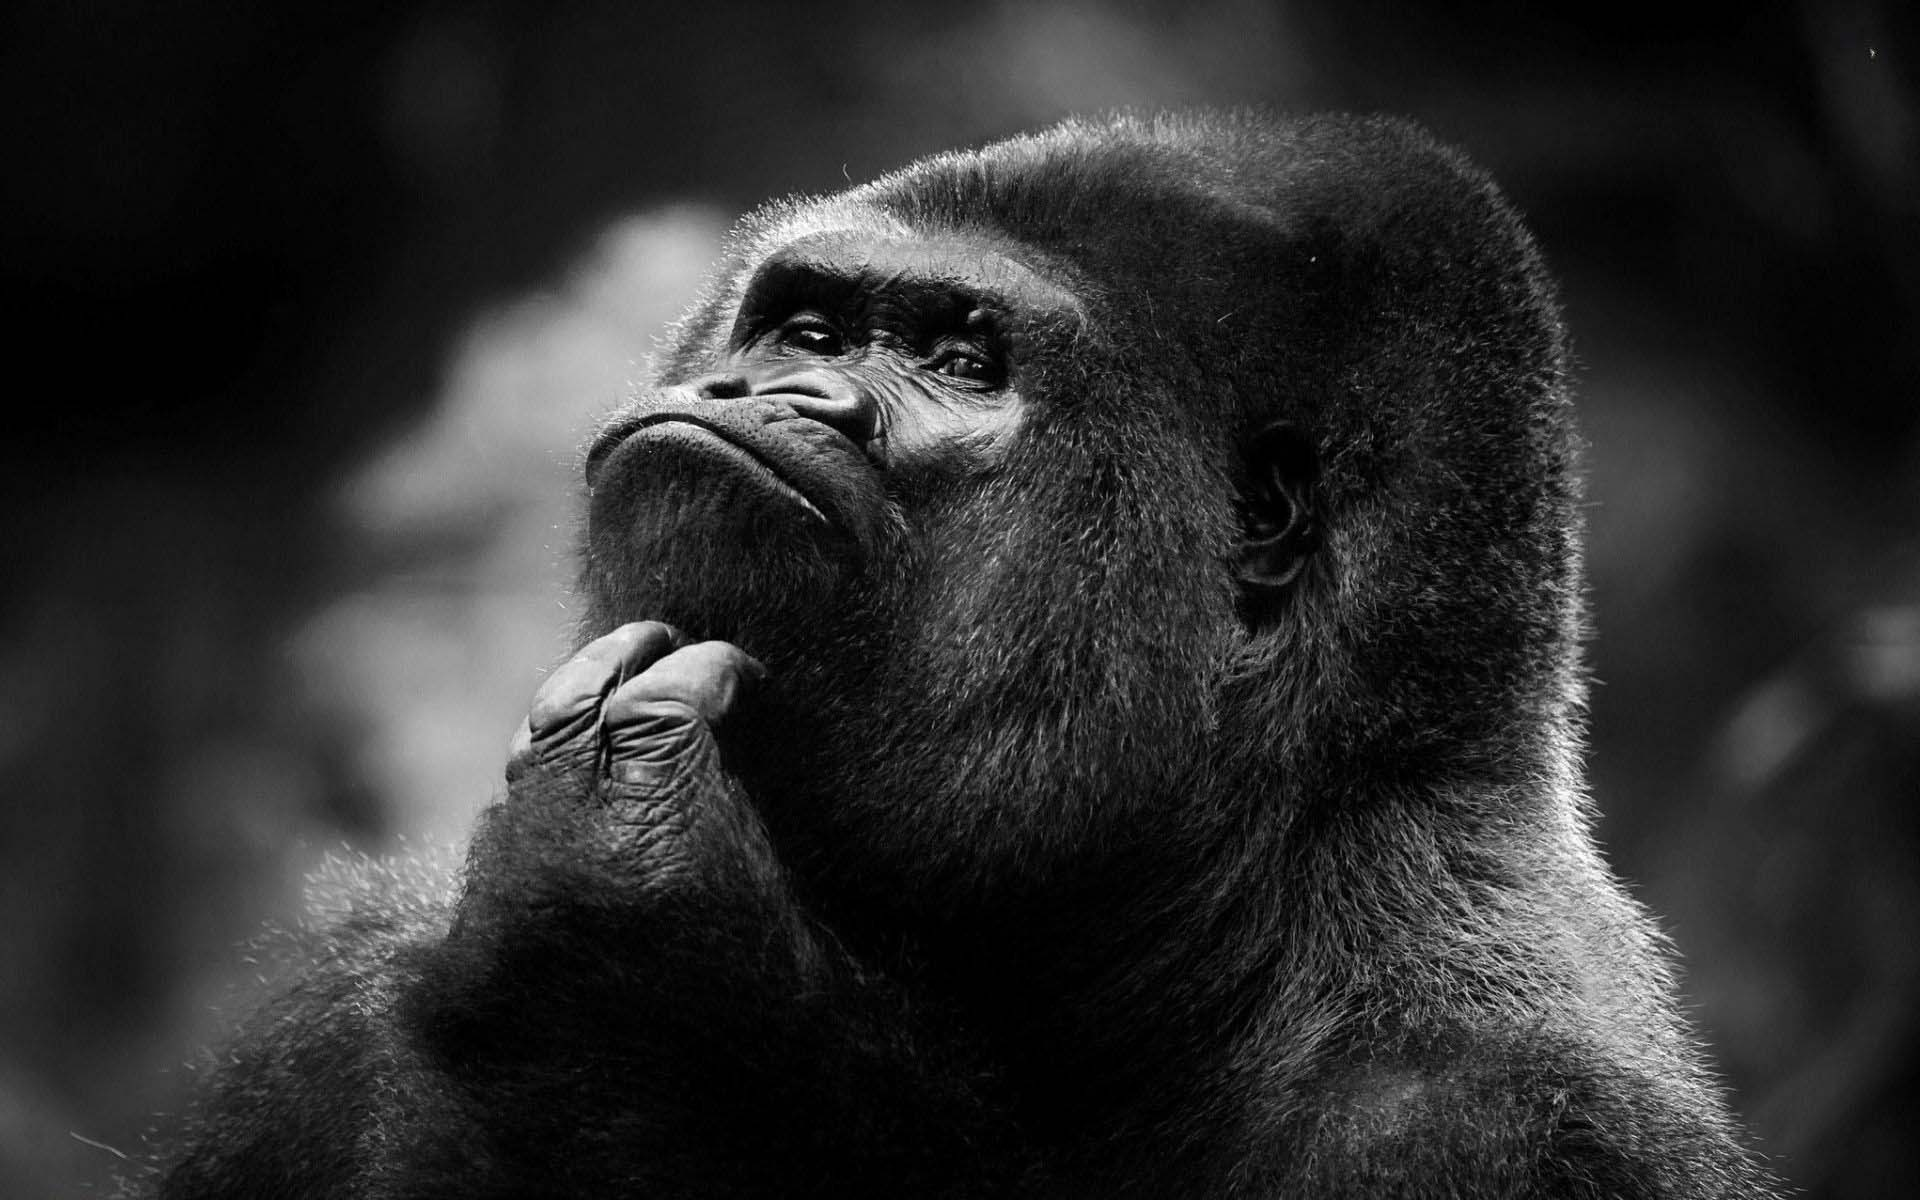 Animal Thinking Gorilla Wallpaper 1920x1200   Cool PC 1920x1200